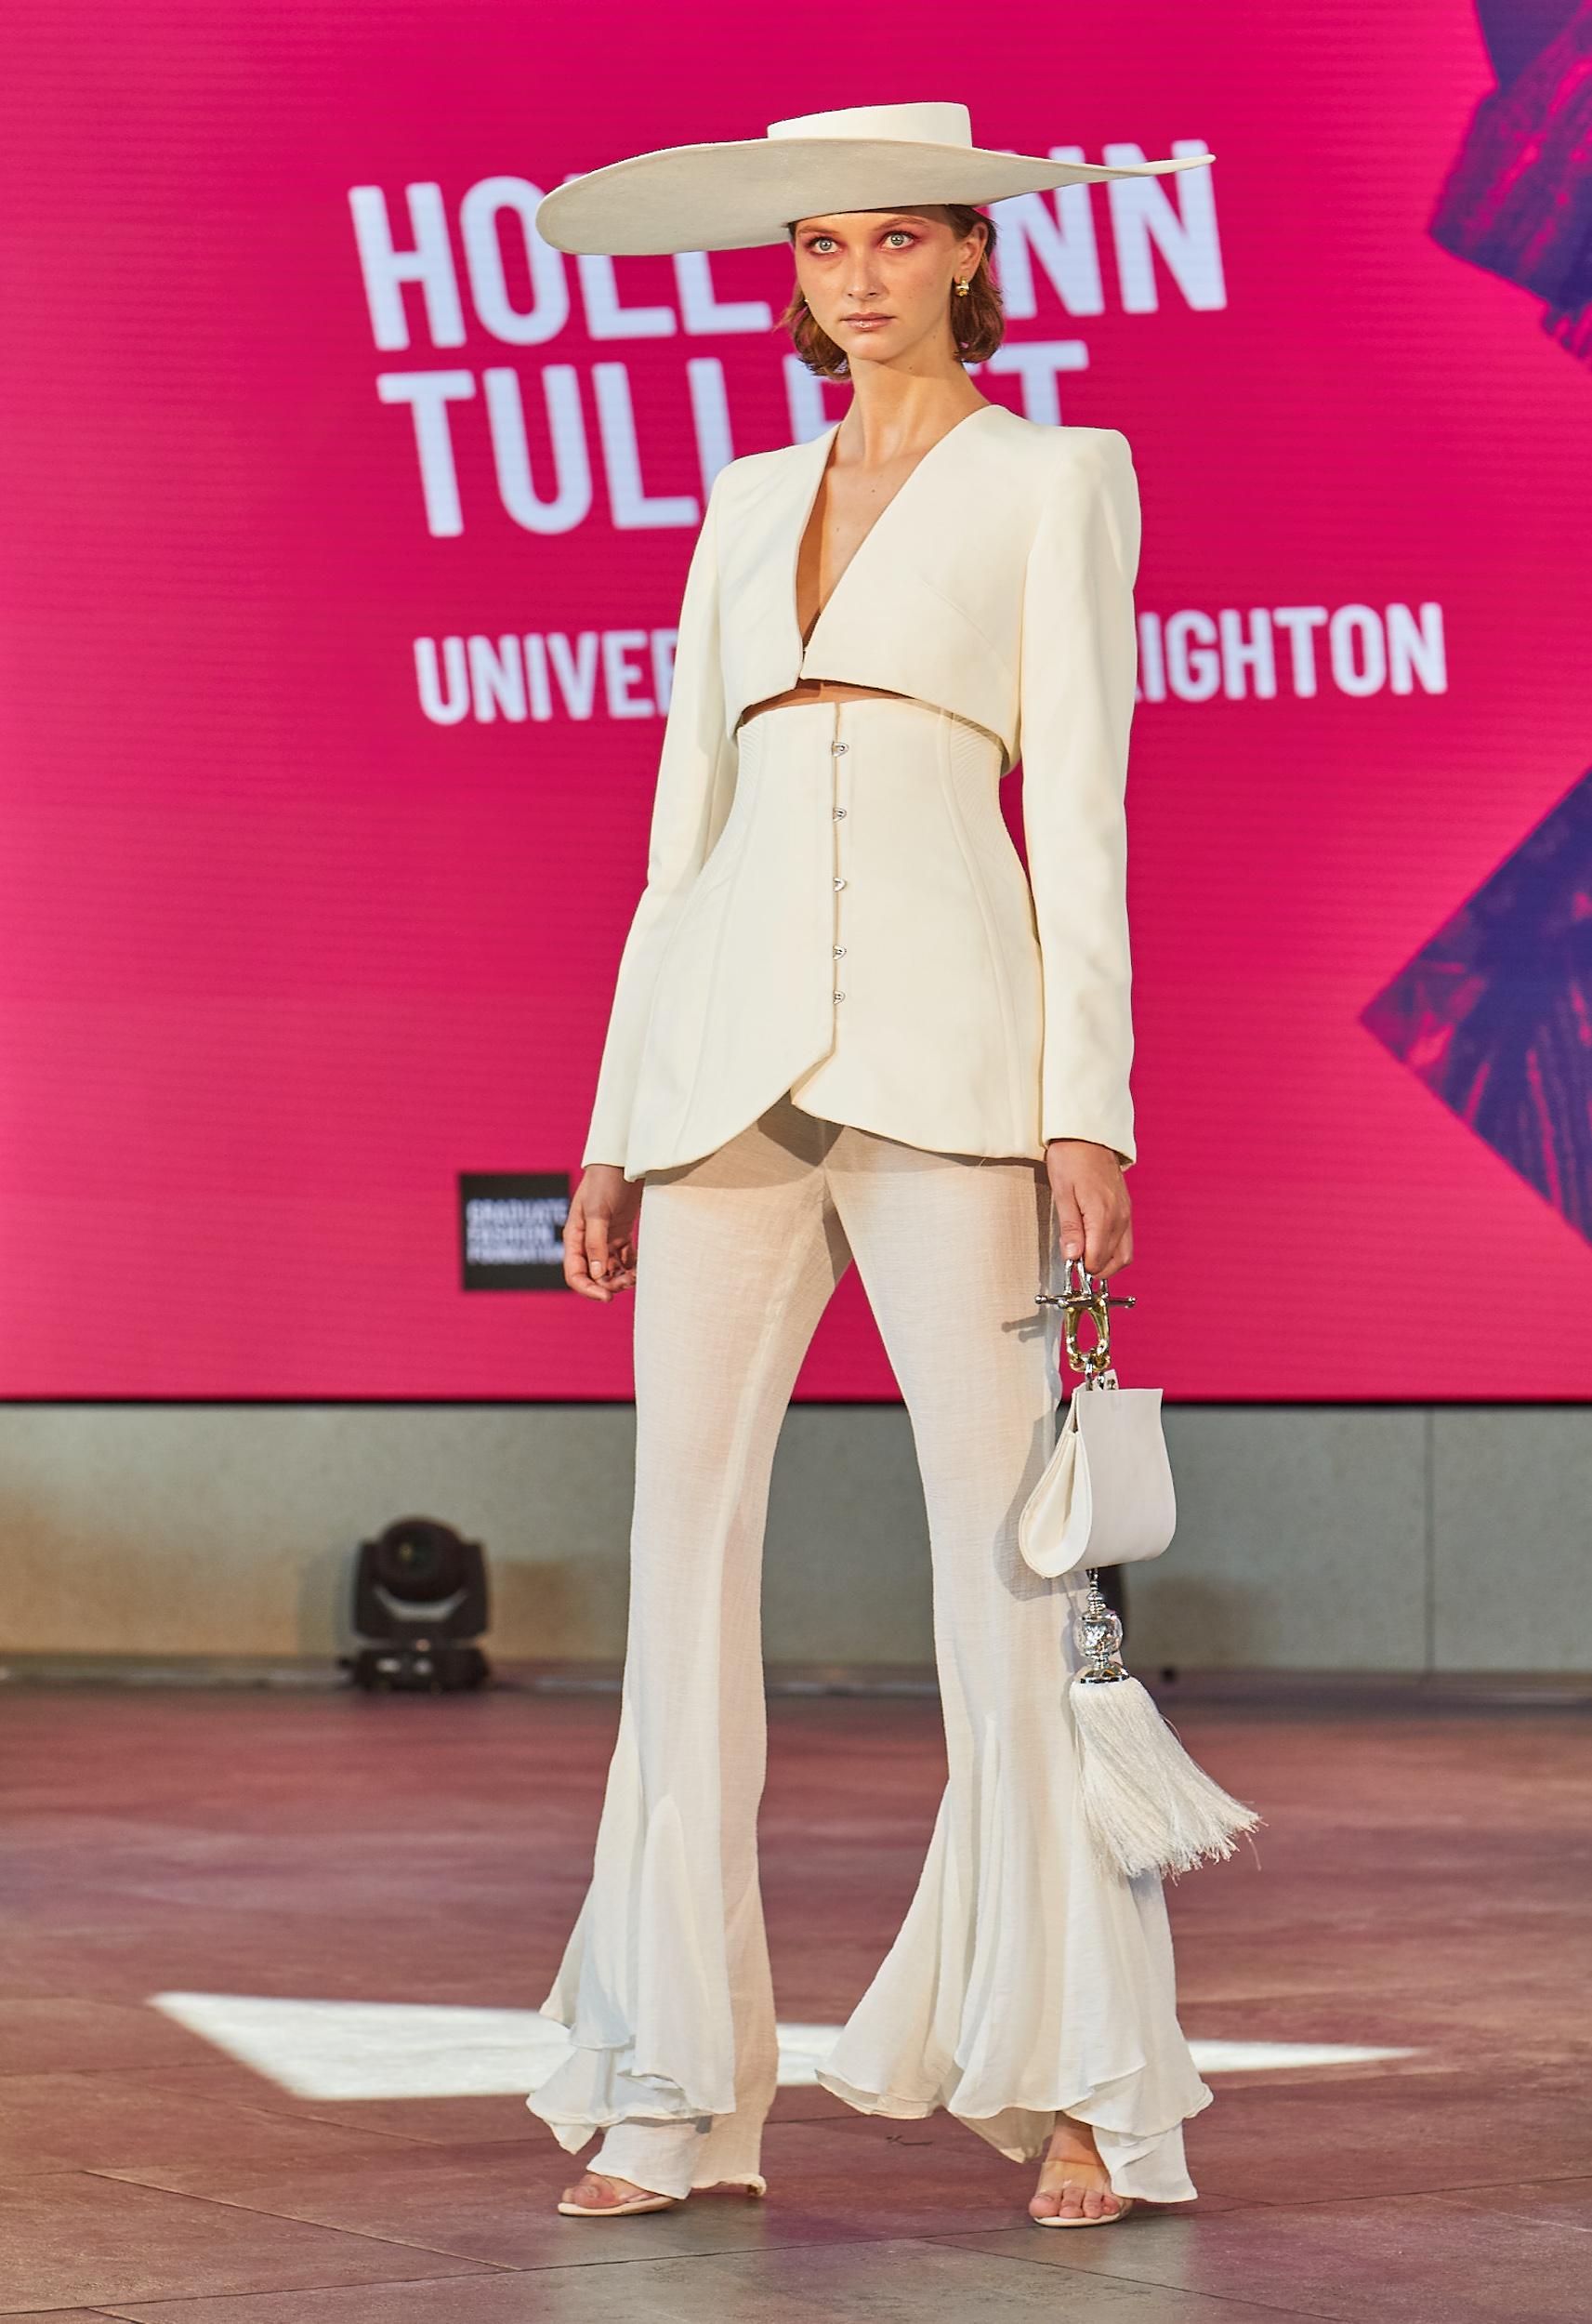 Graduate Fashion Foundation Spring 2021 Fashion Show Photos